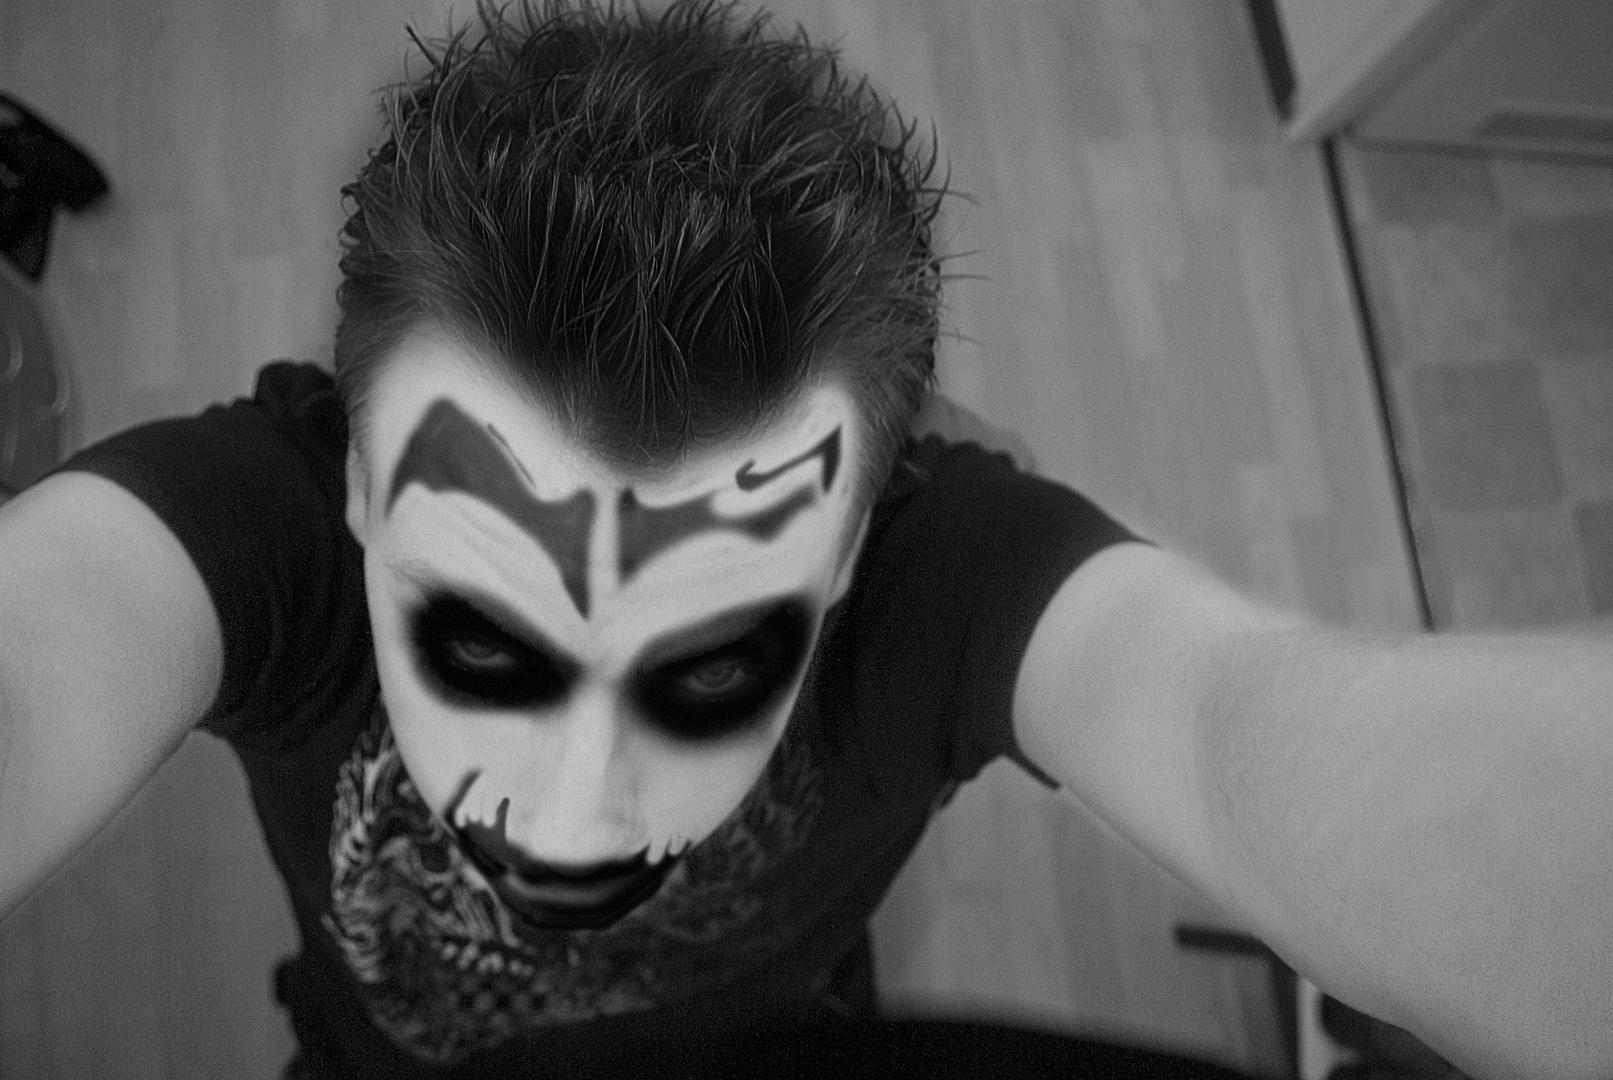 Psycho Clown Juggalo